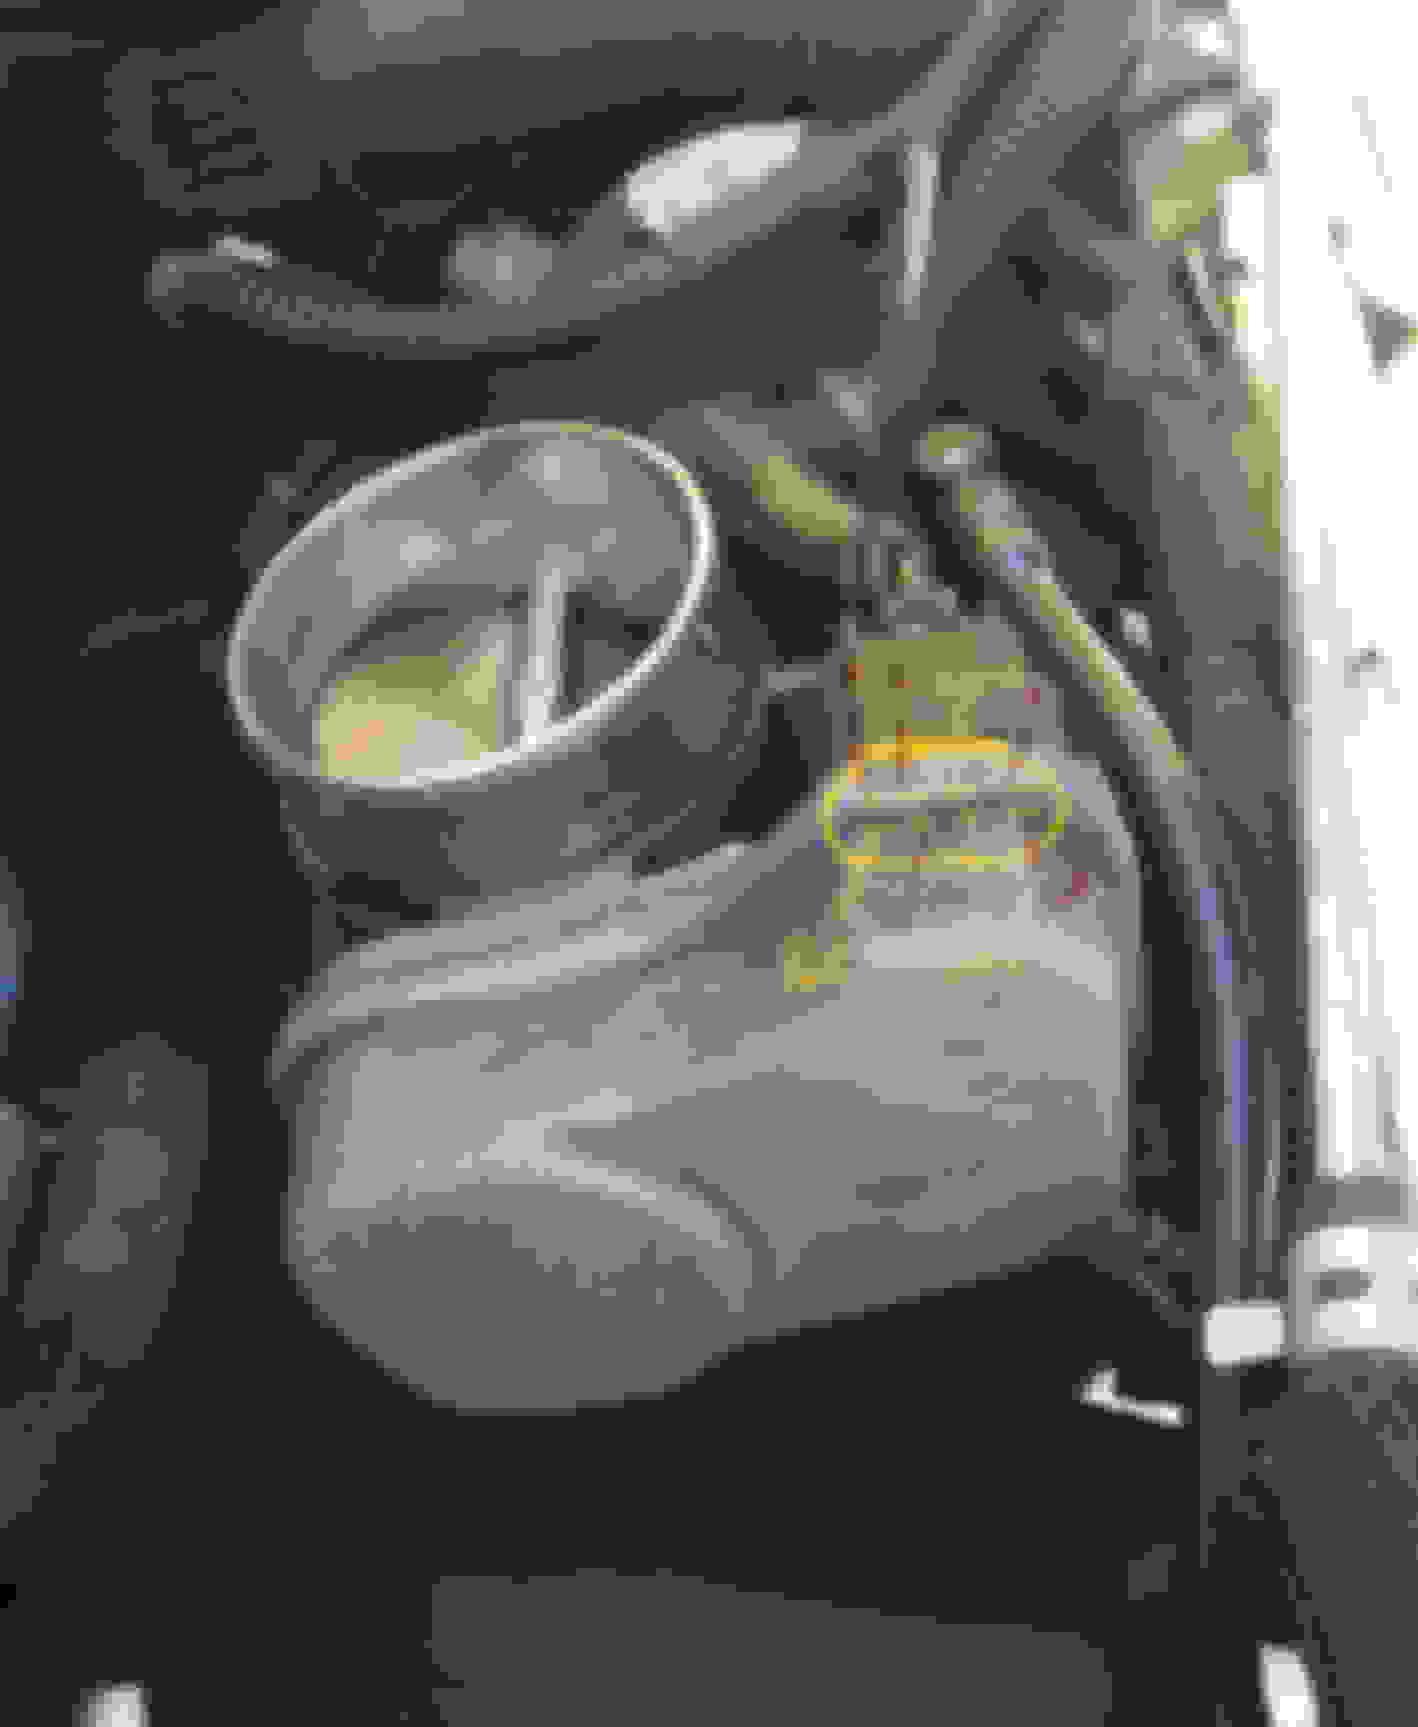 P2101 Reduced Engine Power Message — Minutemanhealthdirect